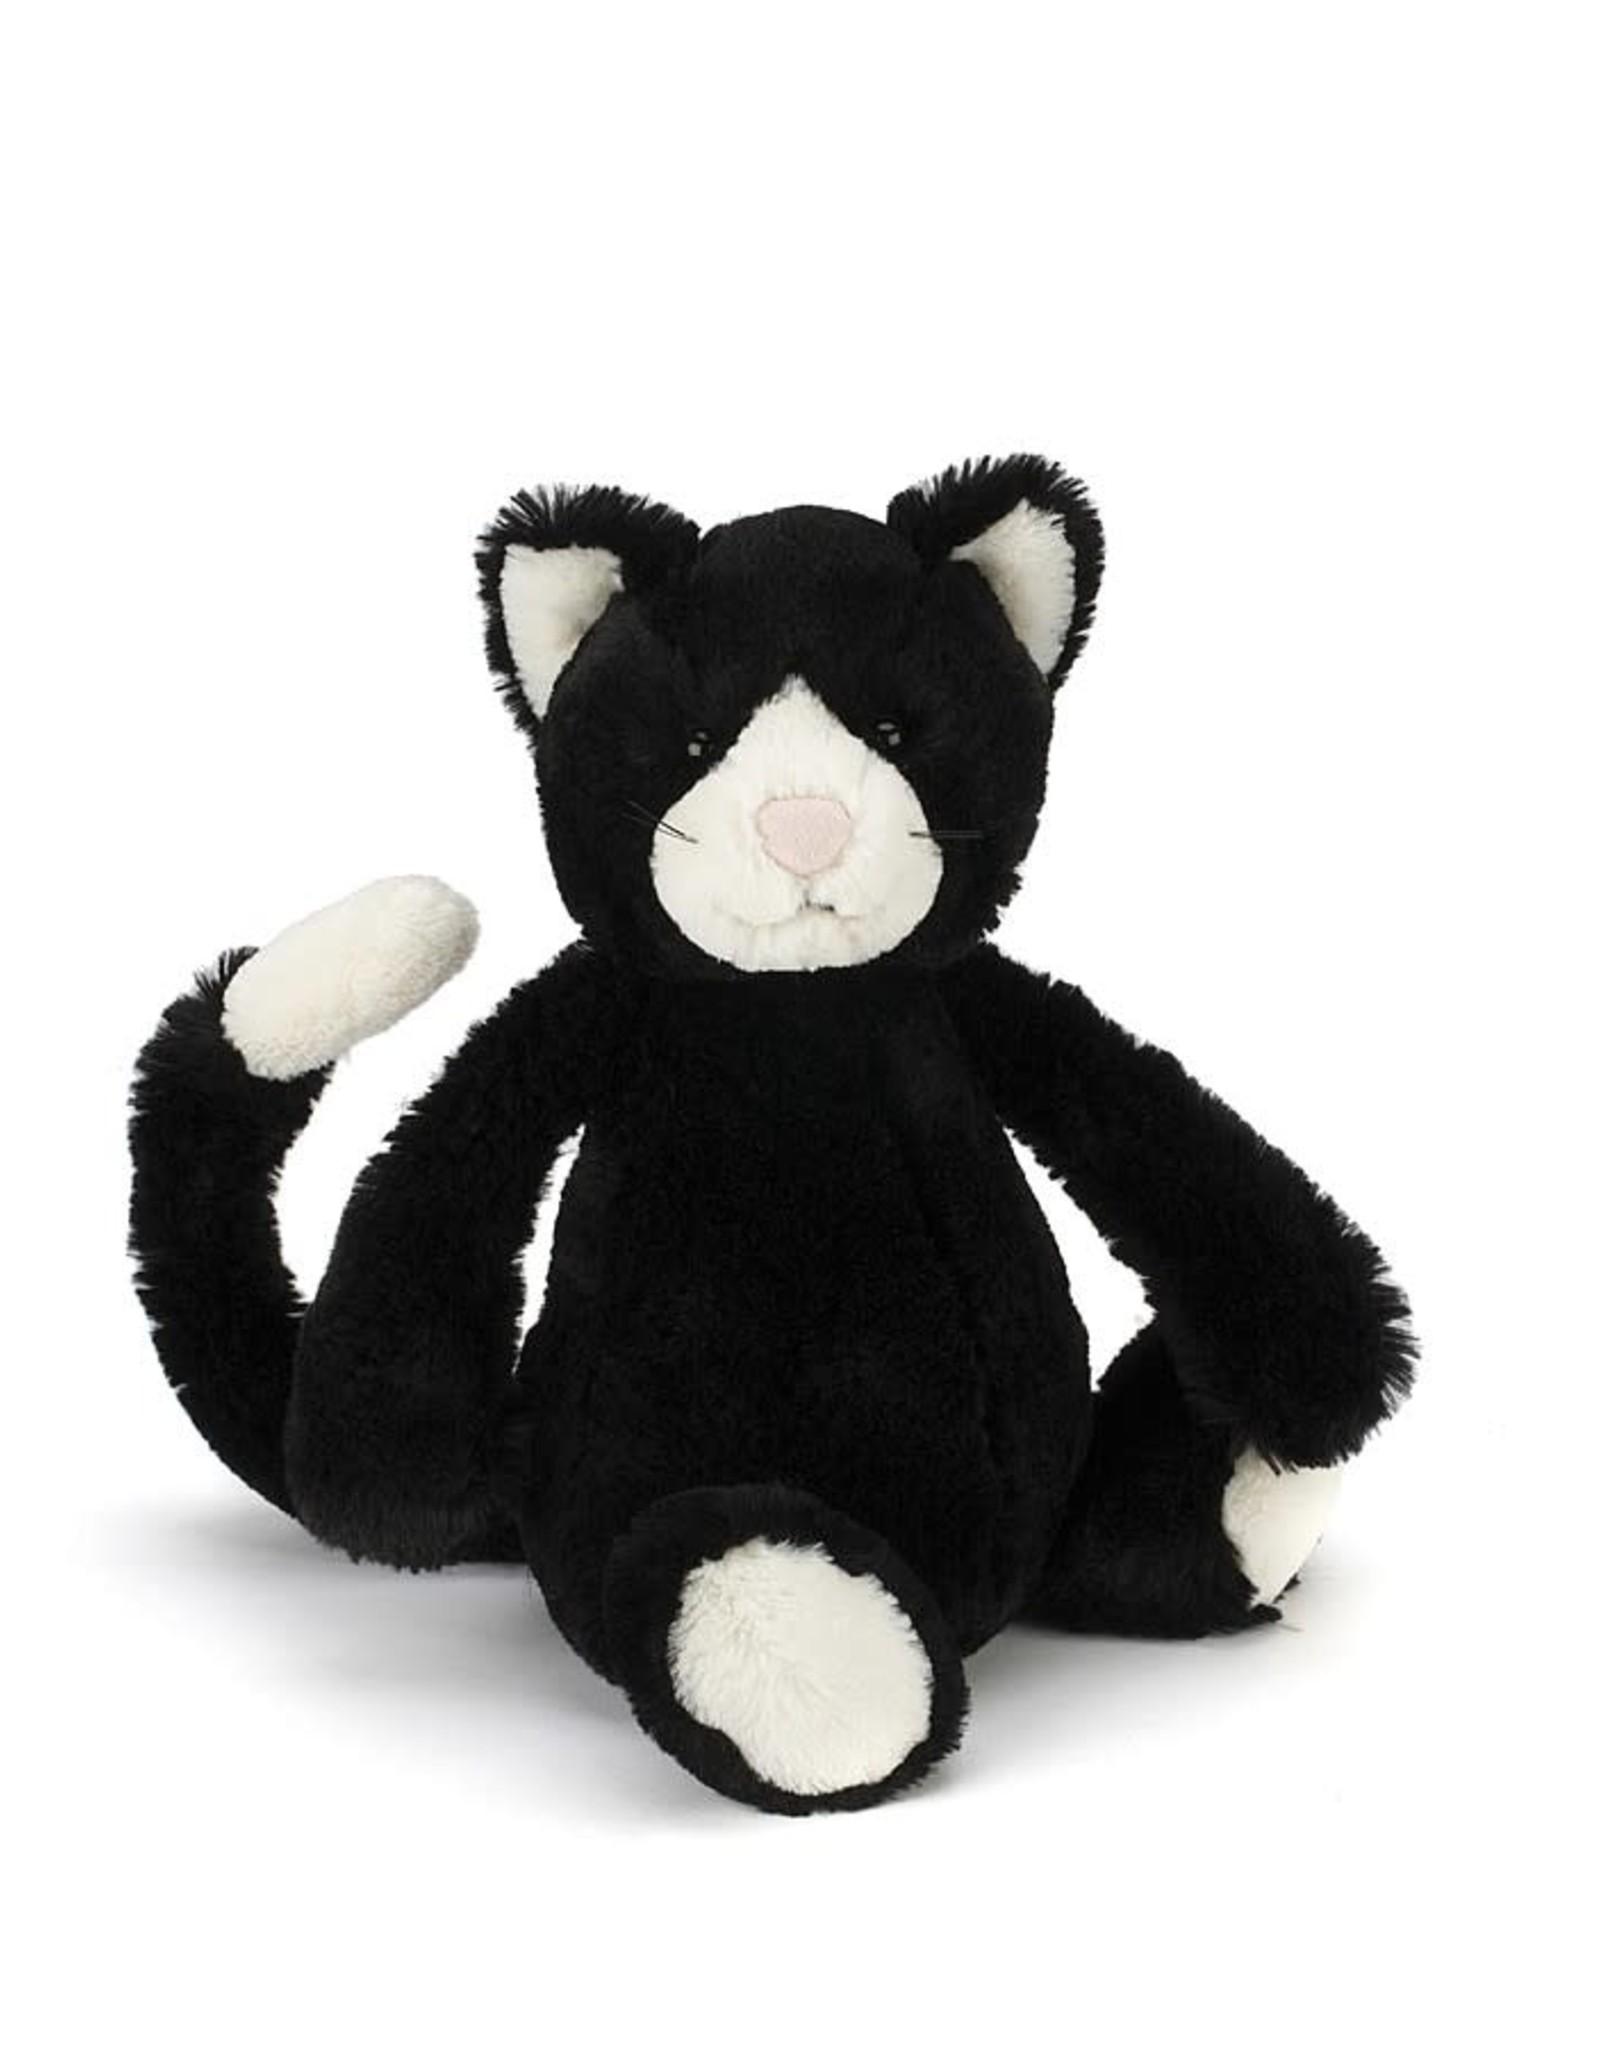 Jellycat Jellycat - Bashful Black & White Kitten Medium